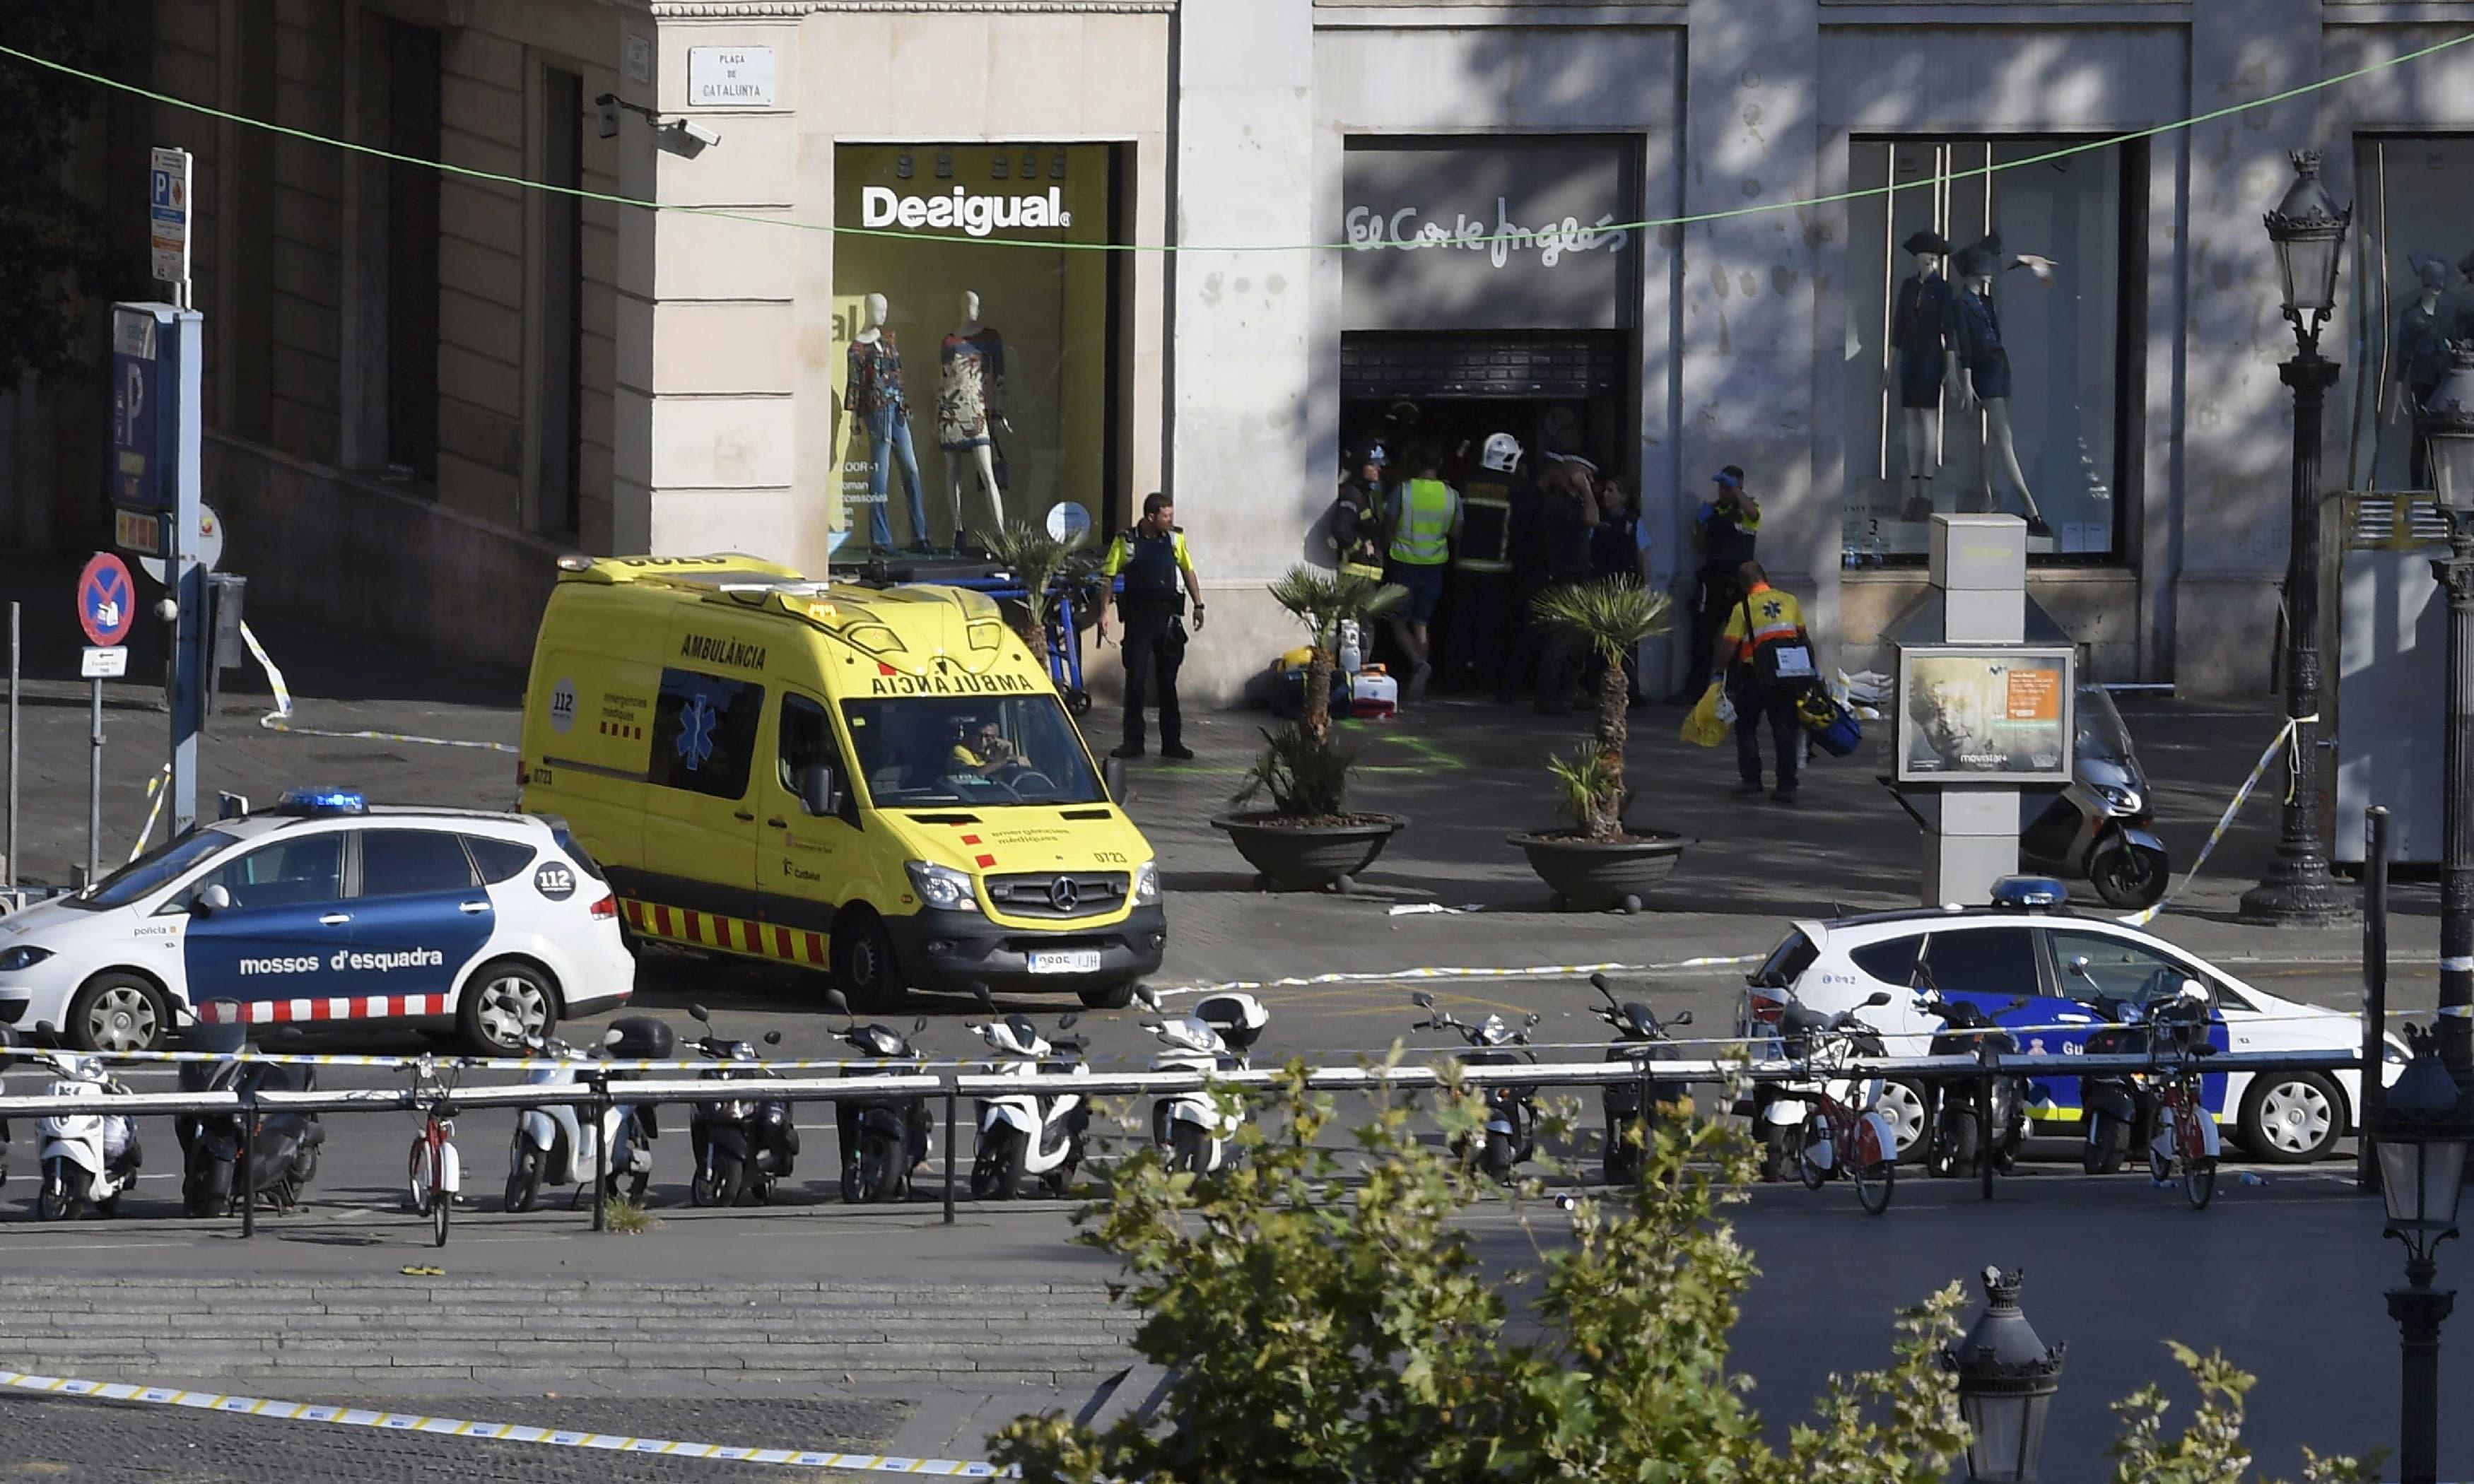 At least 13 dead as van rams into crowd in Barcelona 'terror attack'